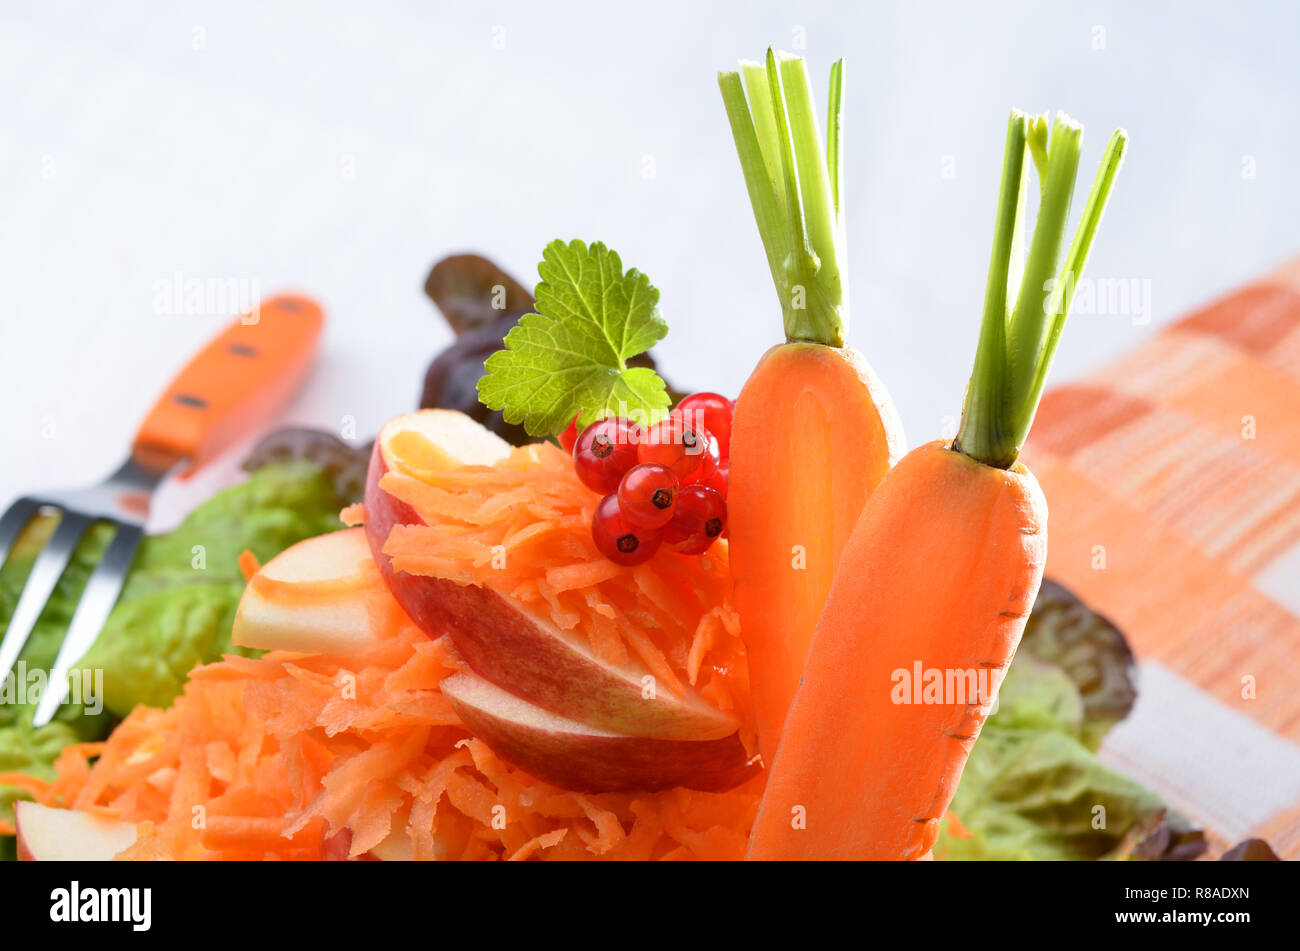 Frischer Salat von carottes Salat, Äpfel. Stockbild